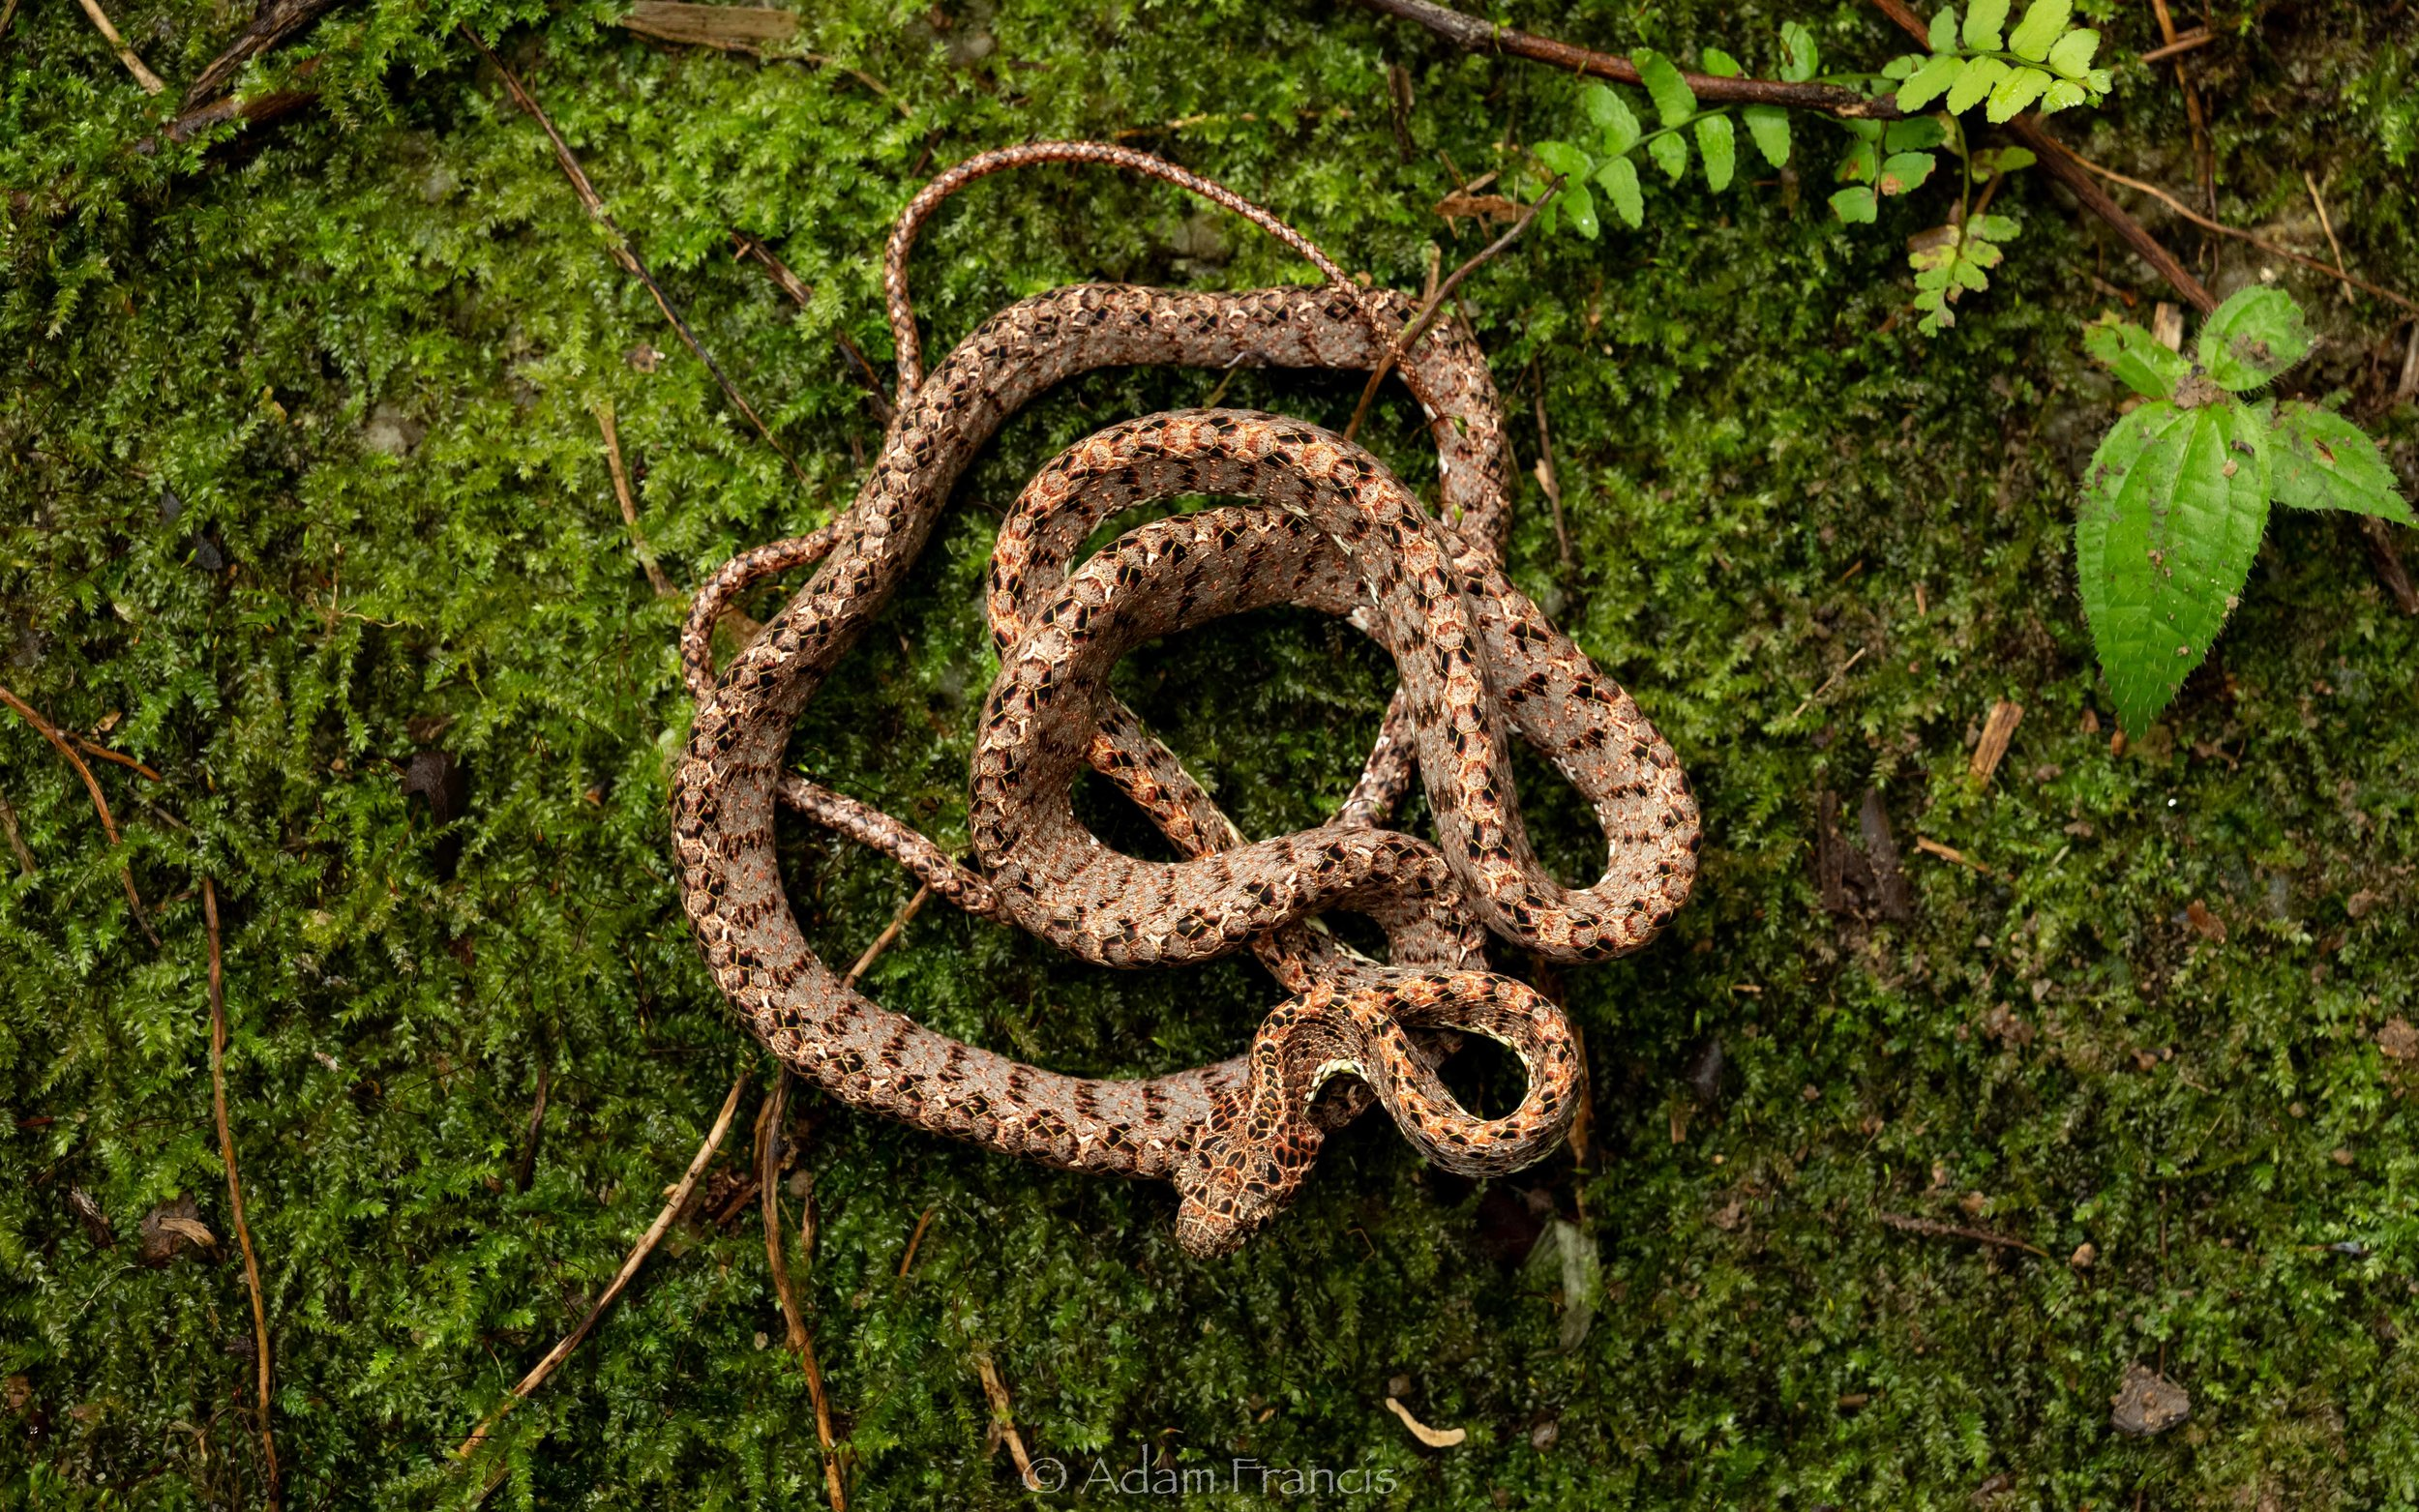 Jasper Cat Snake - Boiga jaspidea